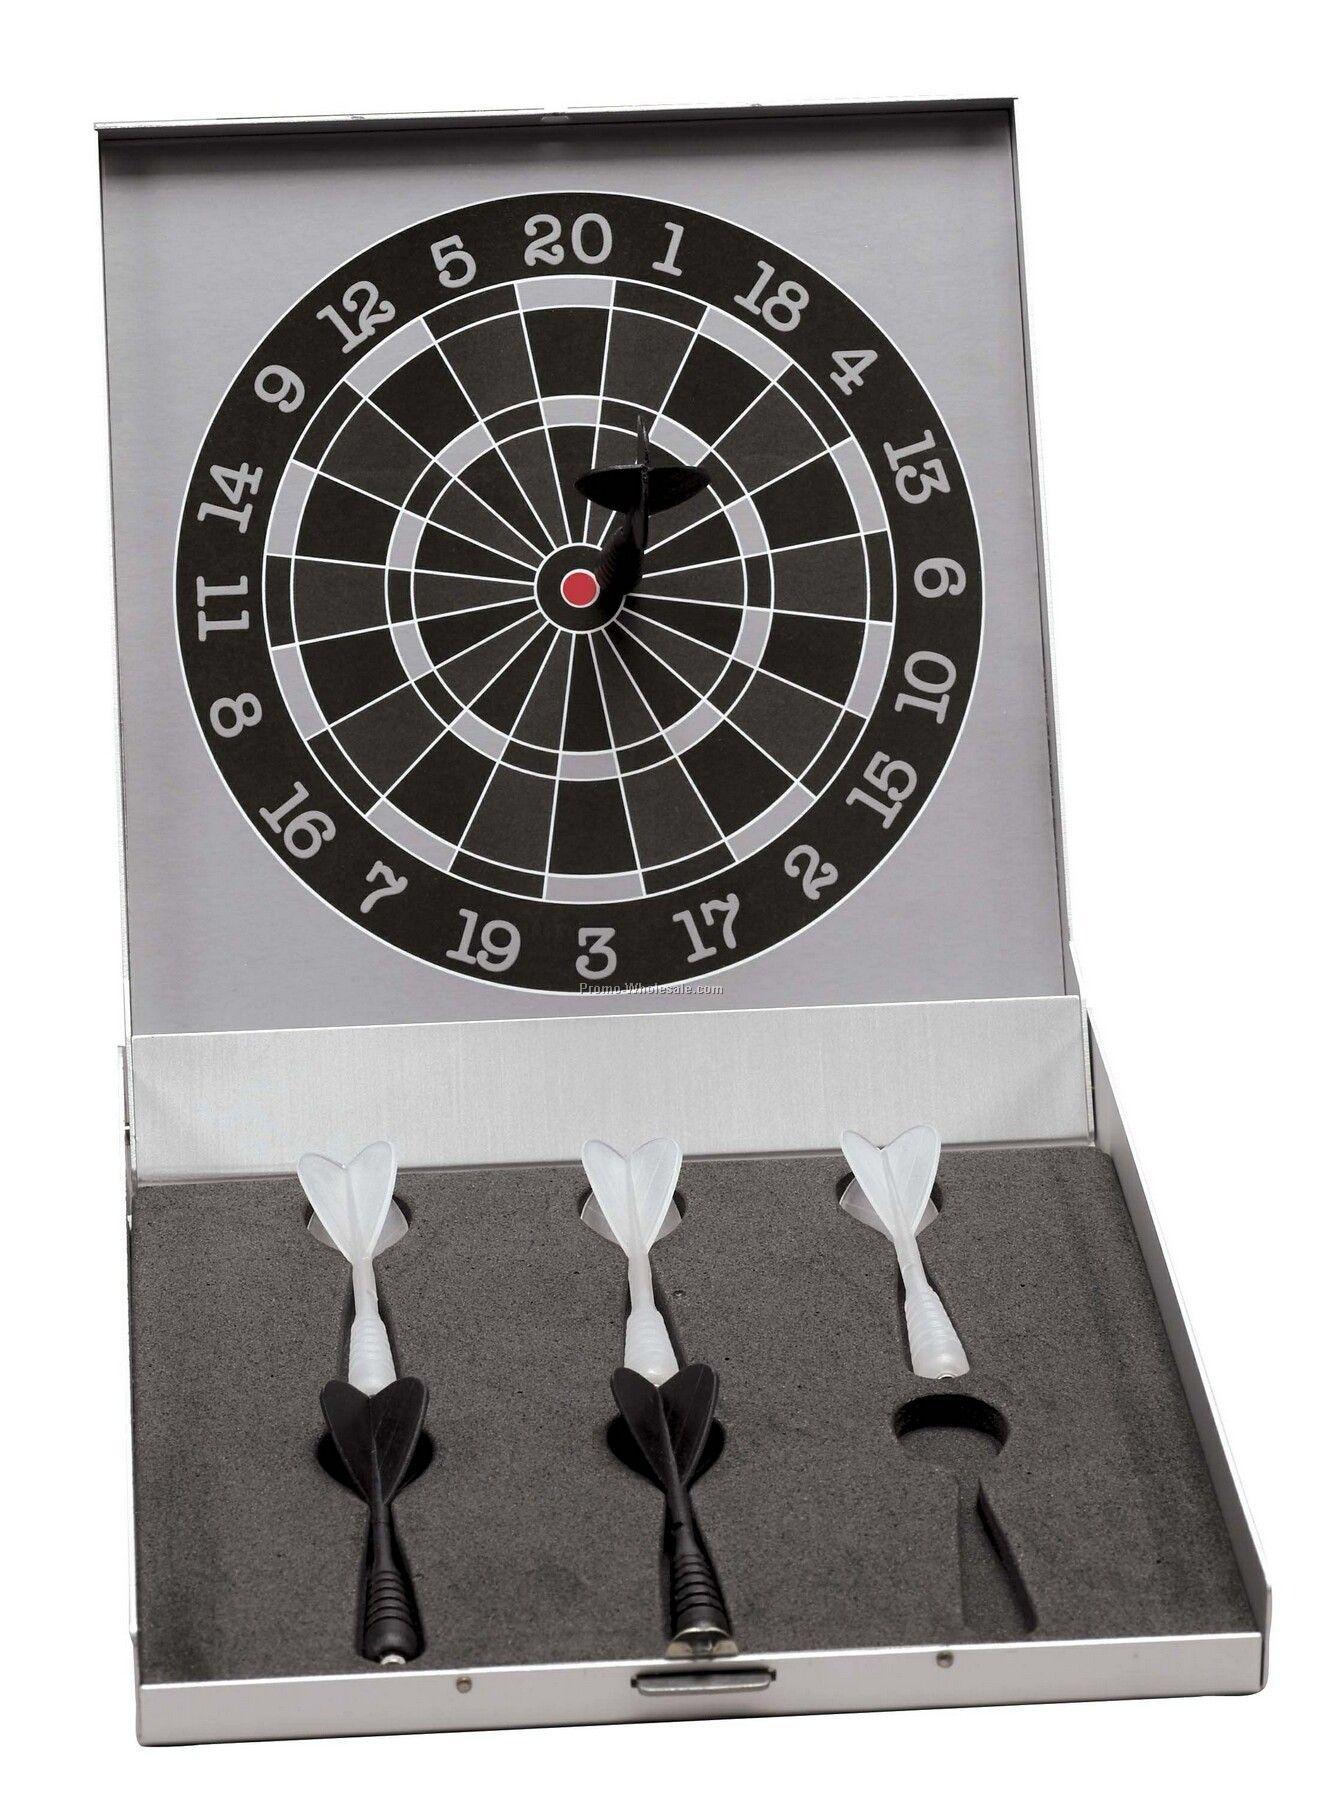 Action Line Desktop Darts